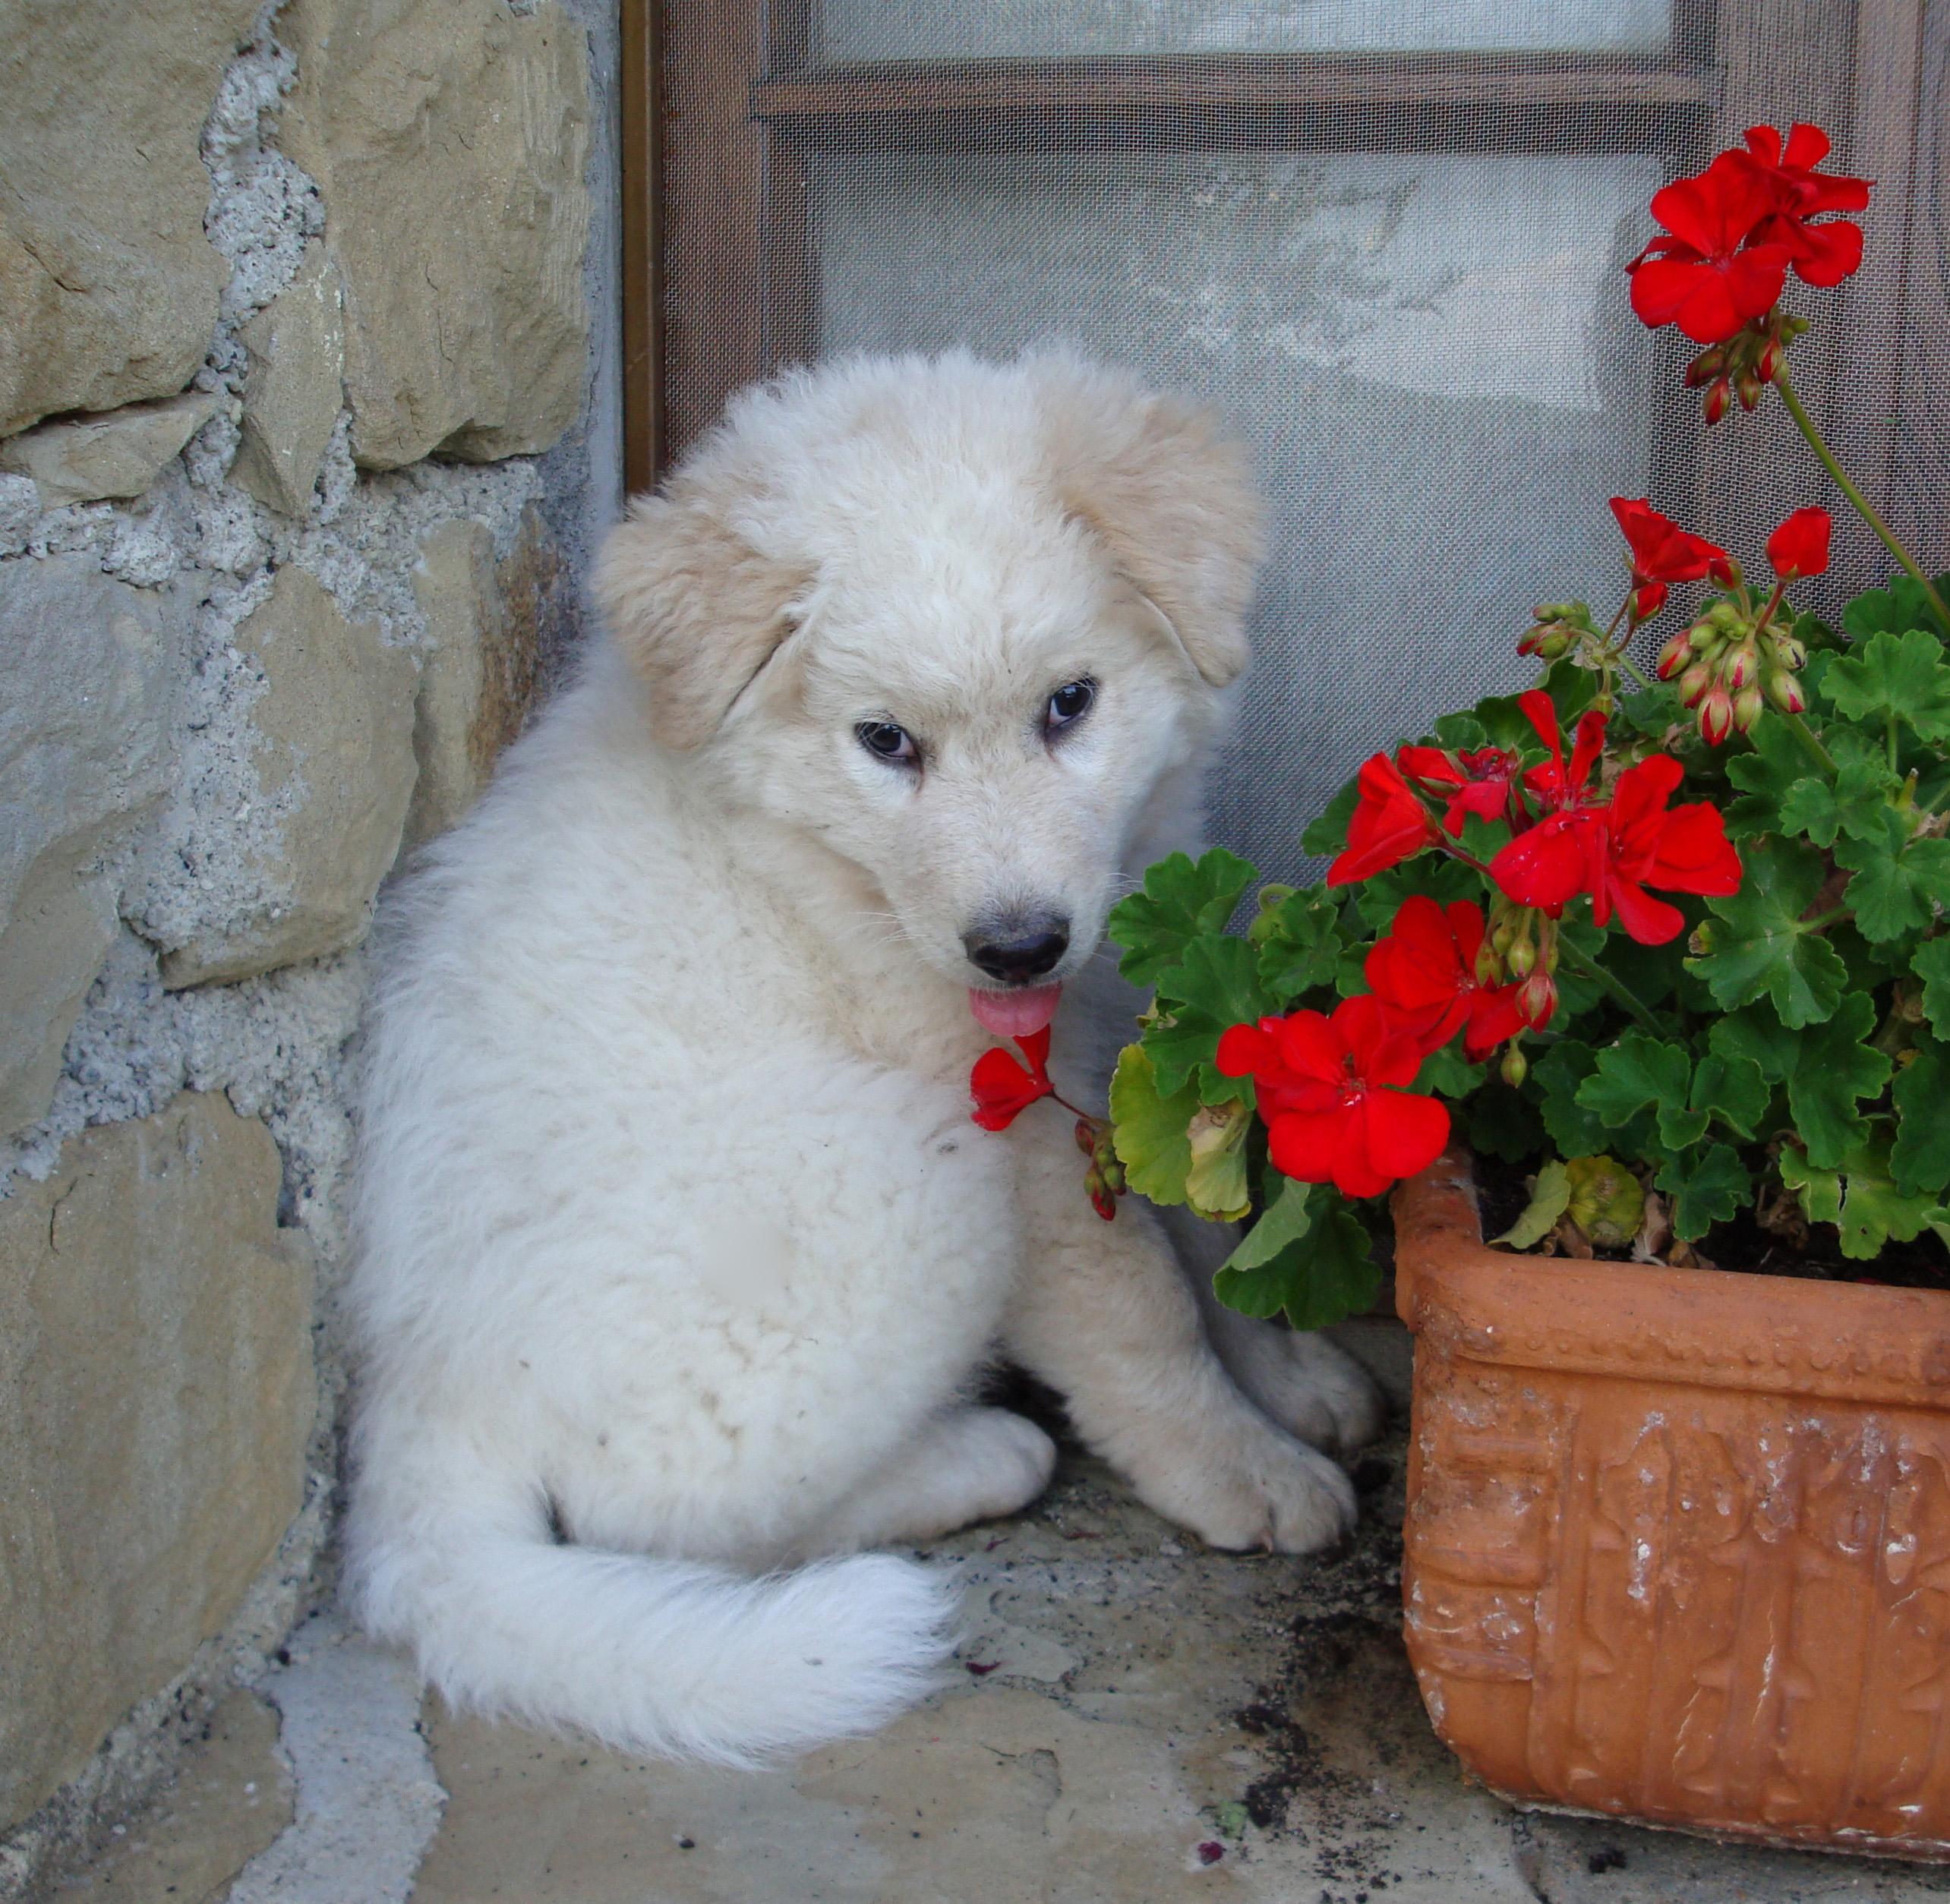 Maremma Sheepdog puppy with a flower wallpaper